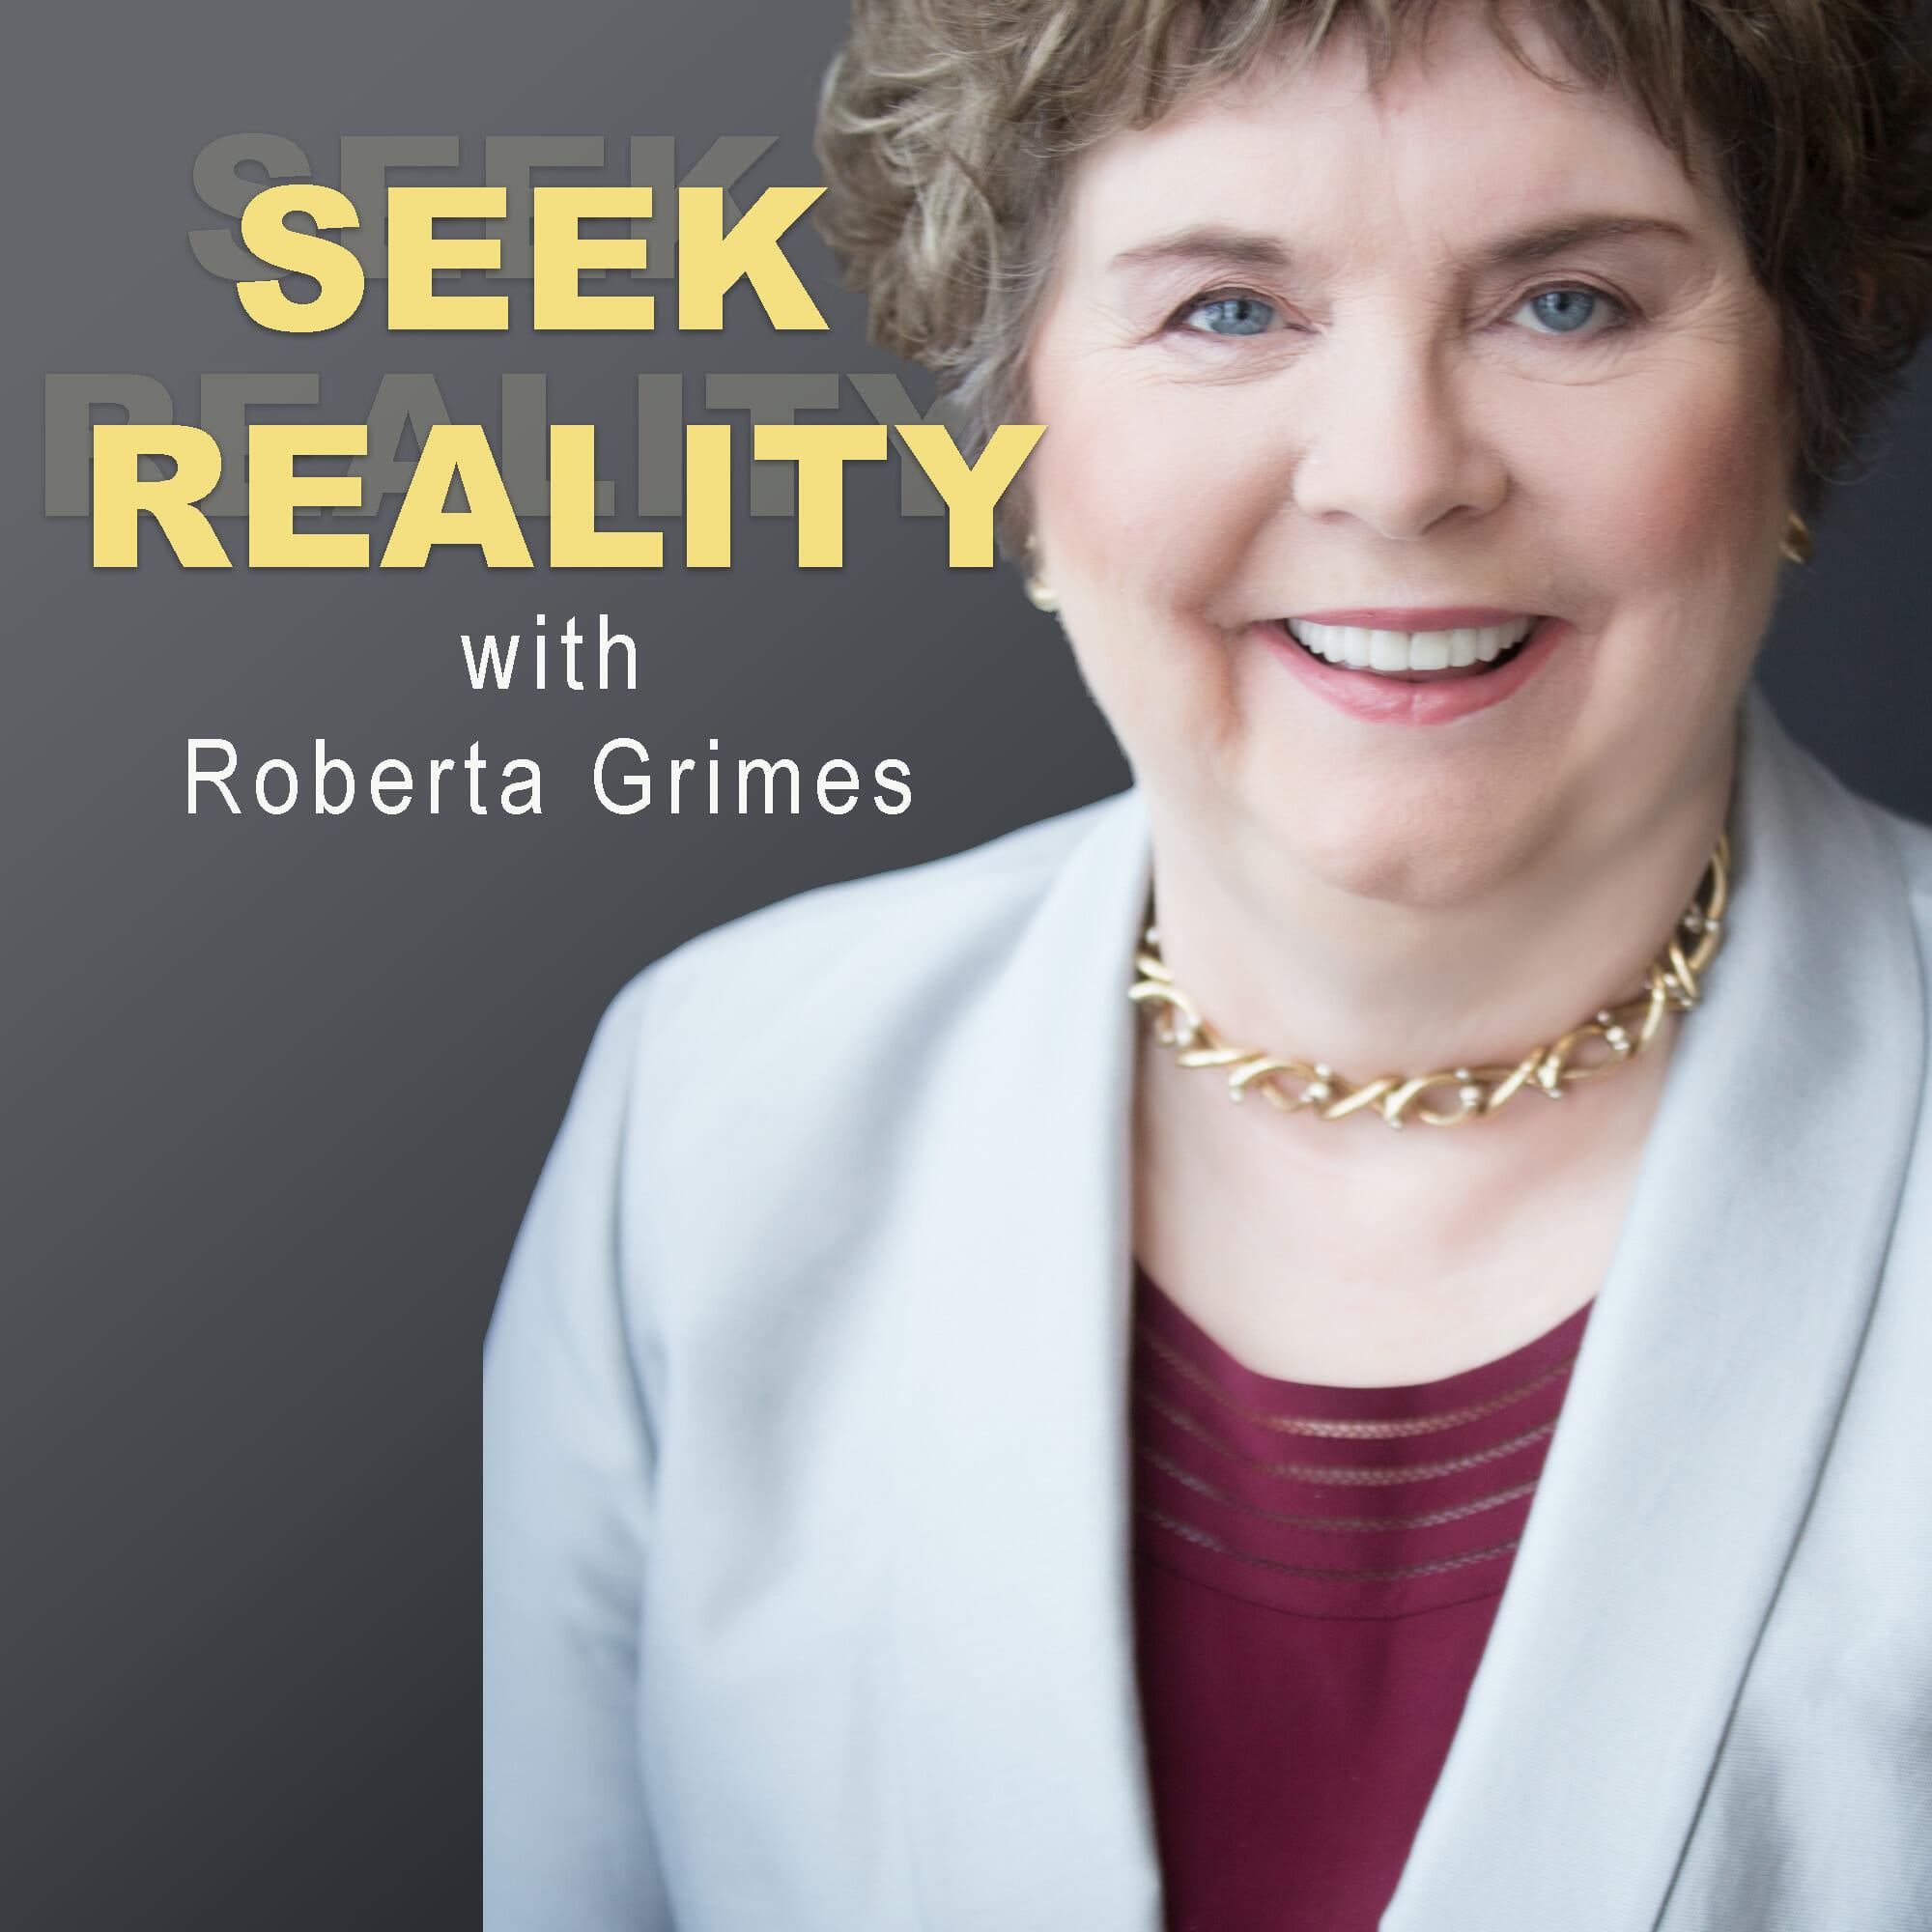 Seek Reality - Roberta Grimes